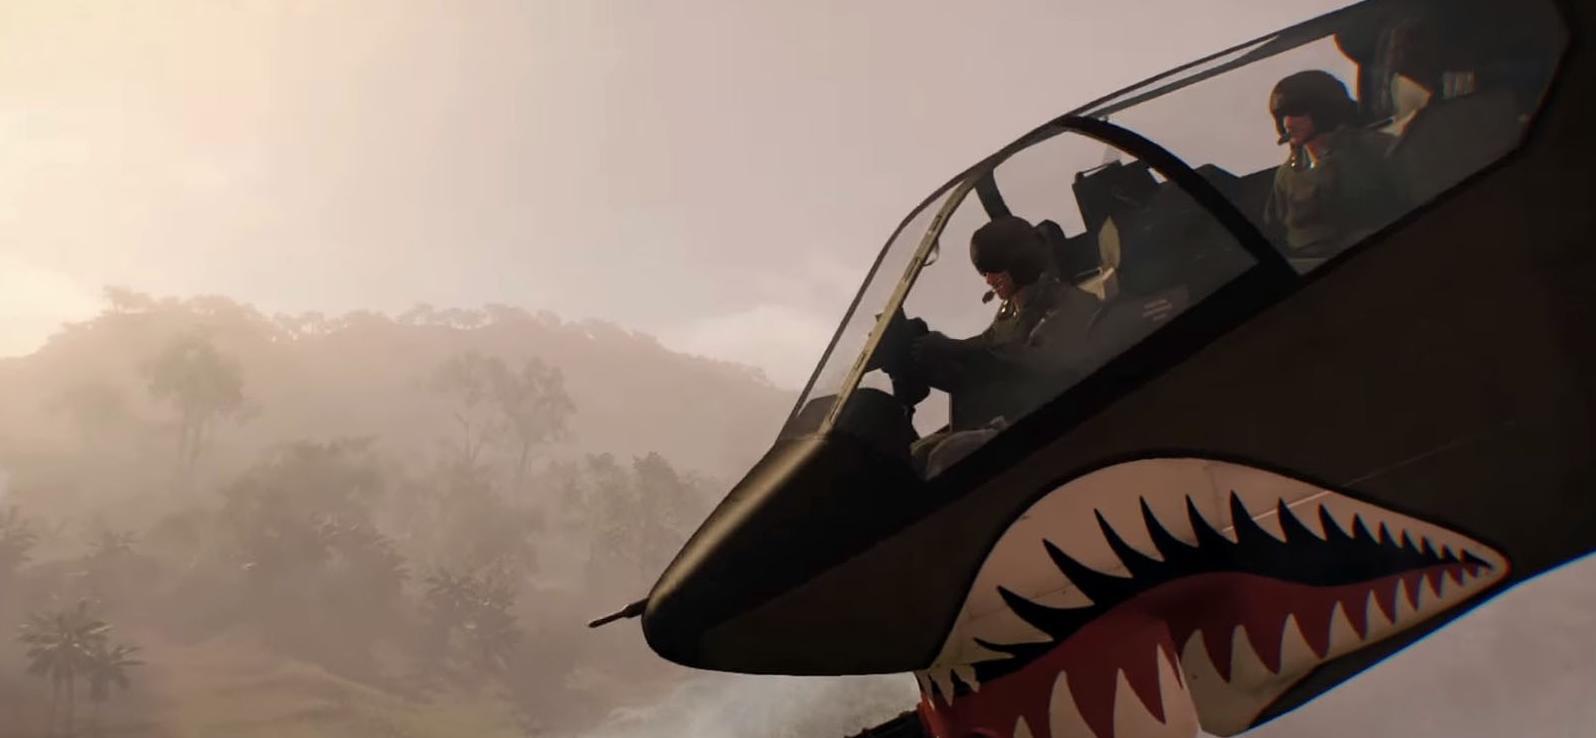 Rising Storm 2: Vietnam - How to Skip Intro Movies